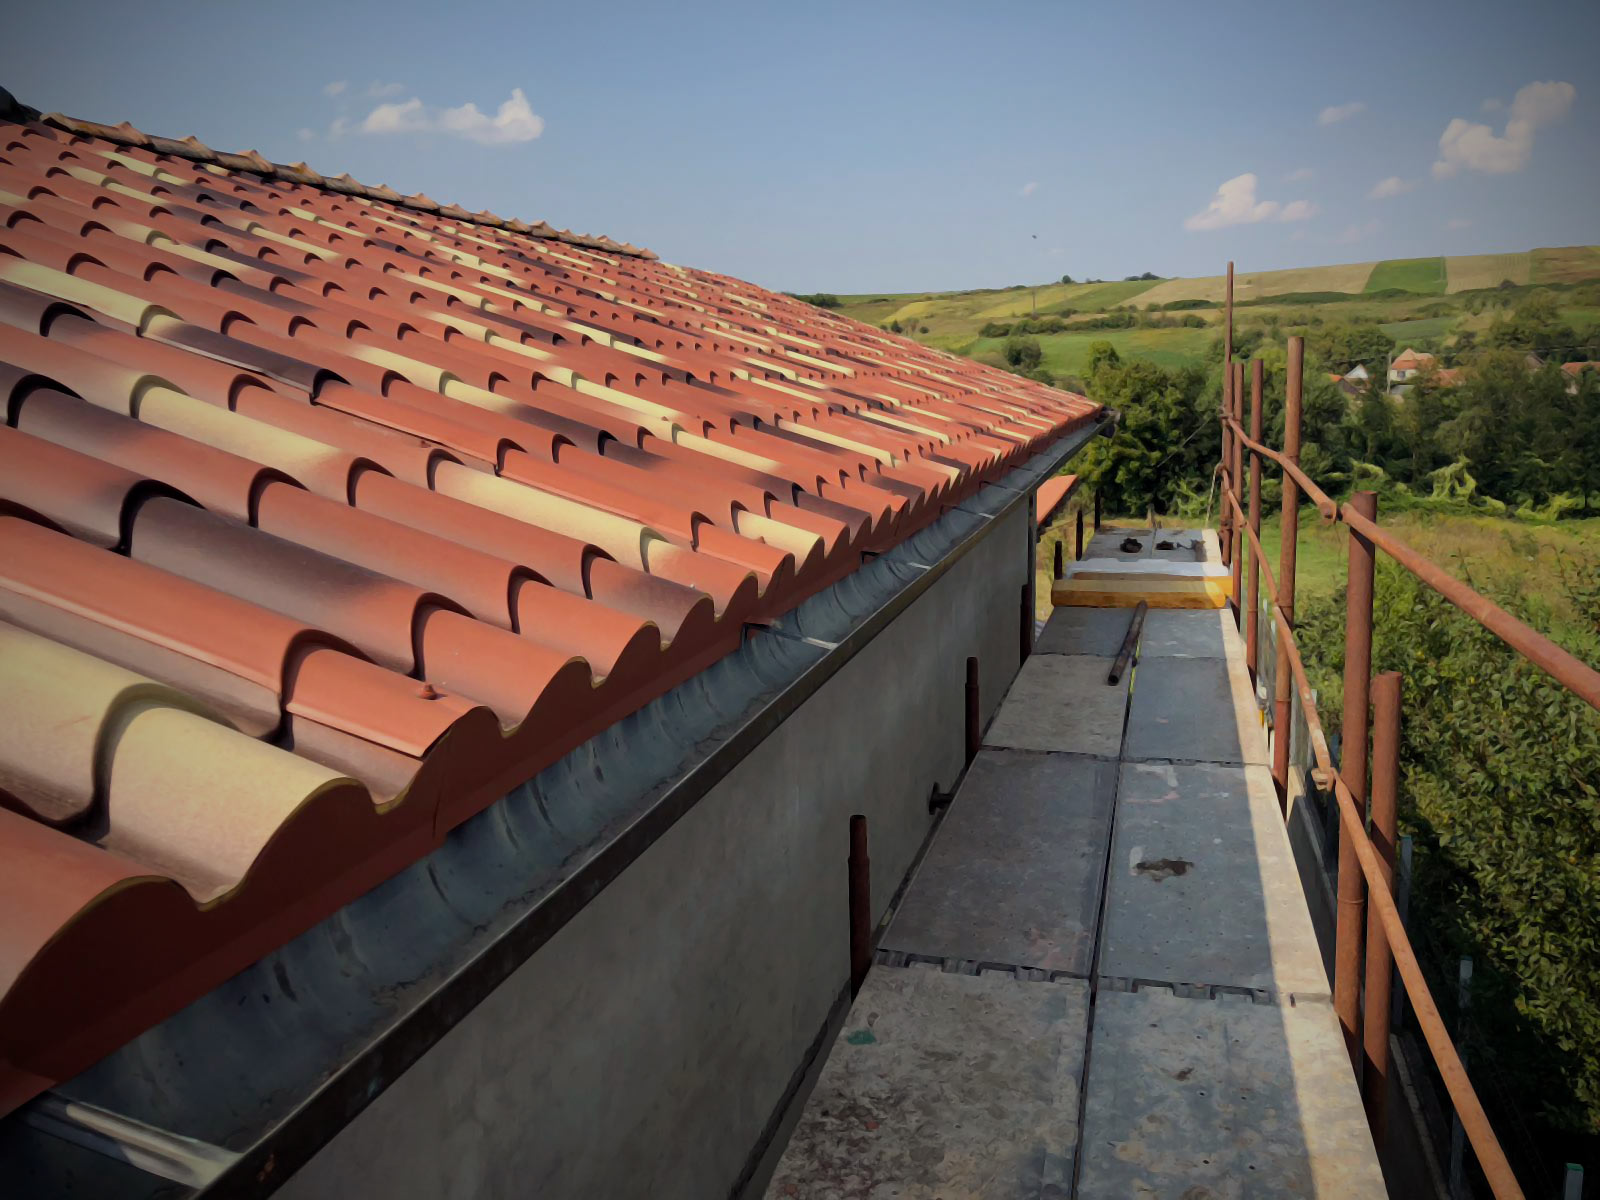 Imprese Edili Varese E Provincia varese impresa edile ristrutturazioni, demolizioni, scavi